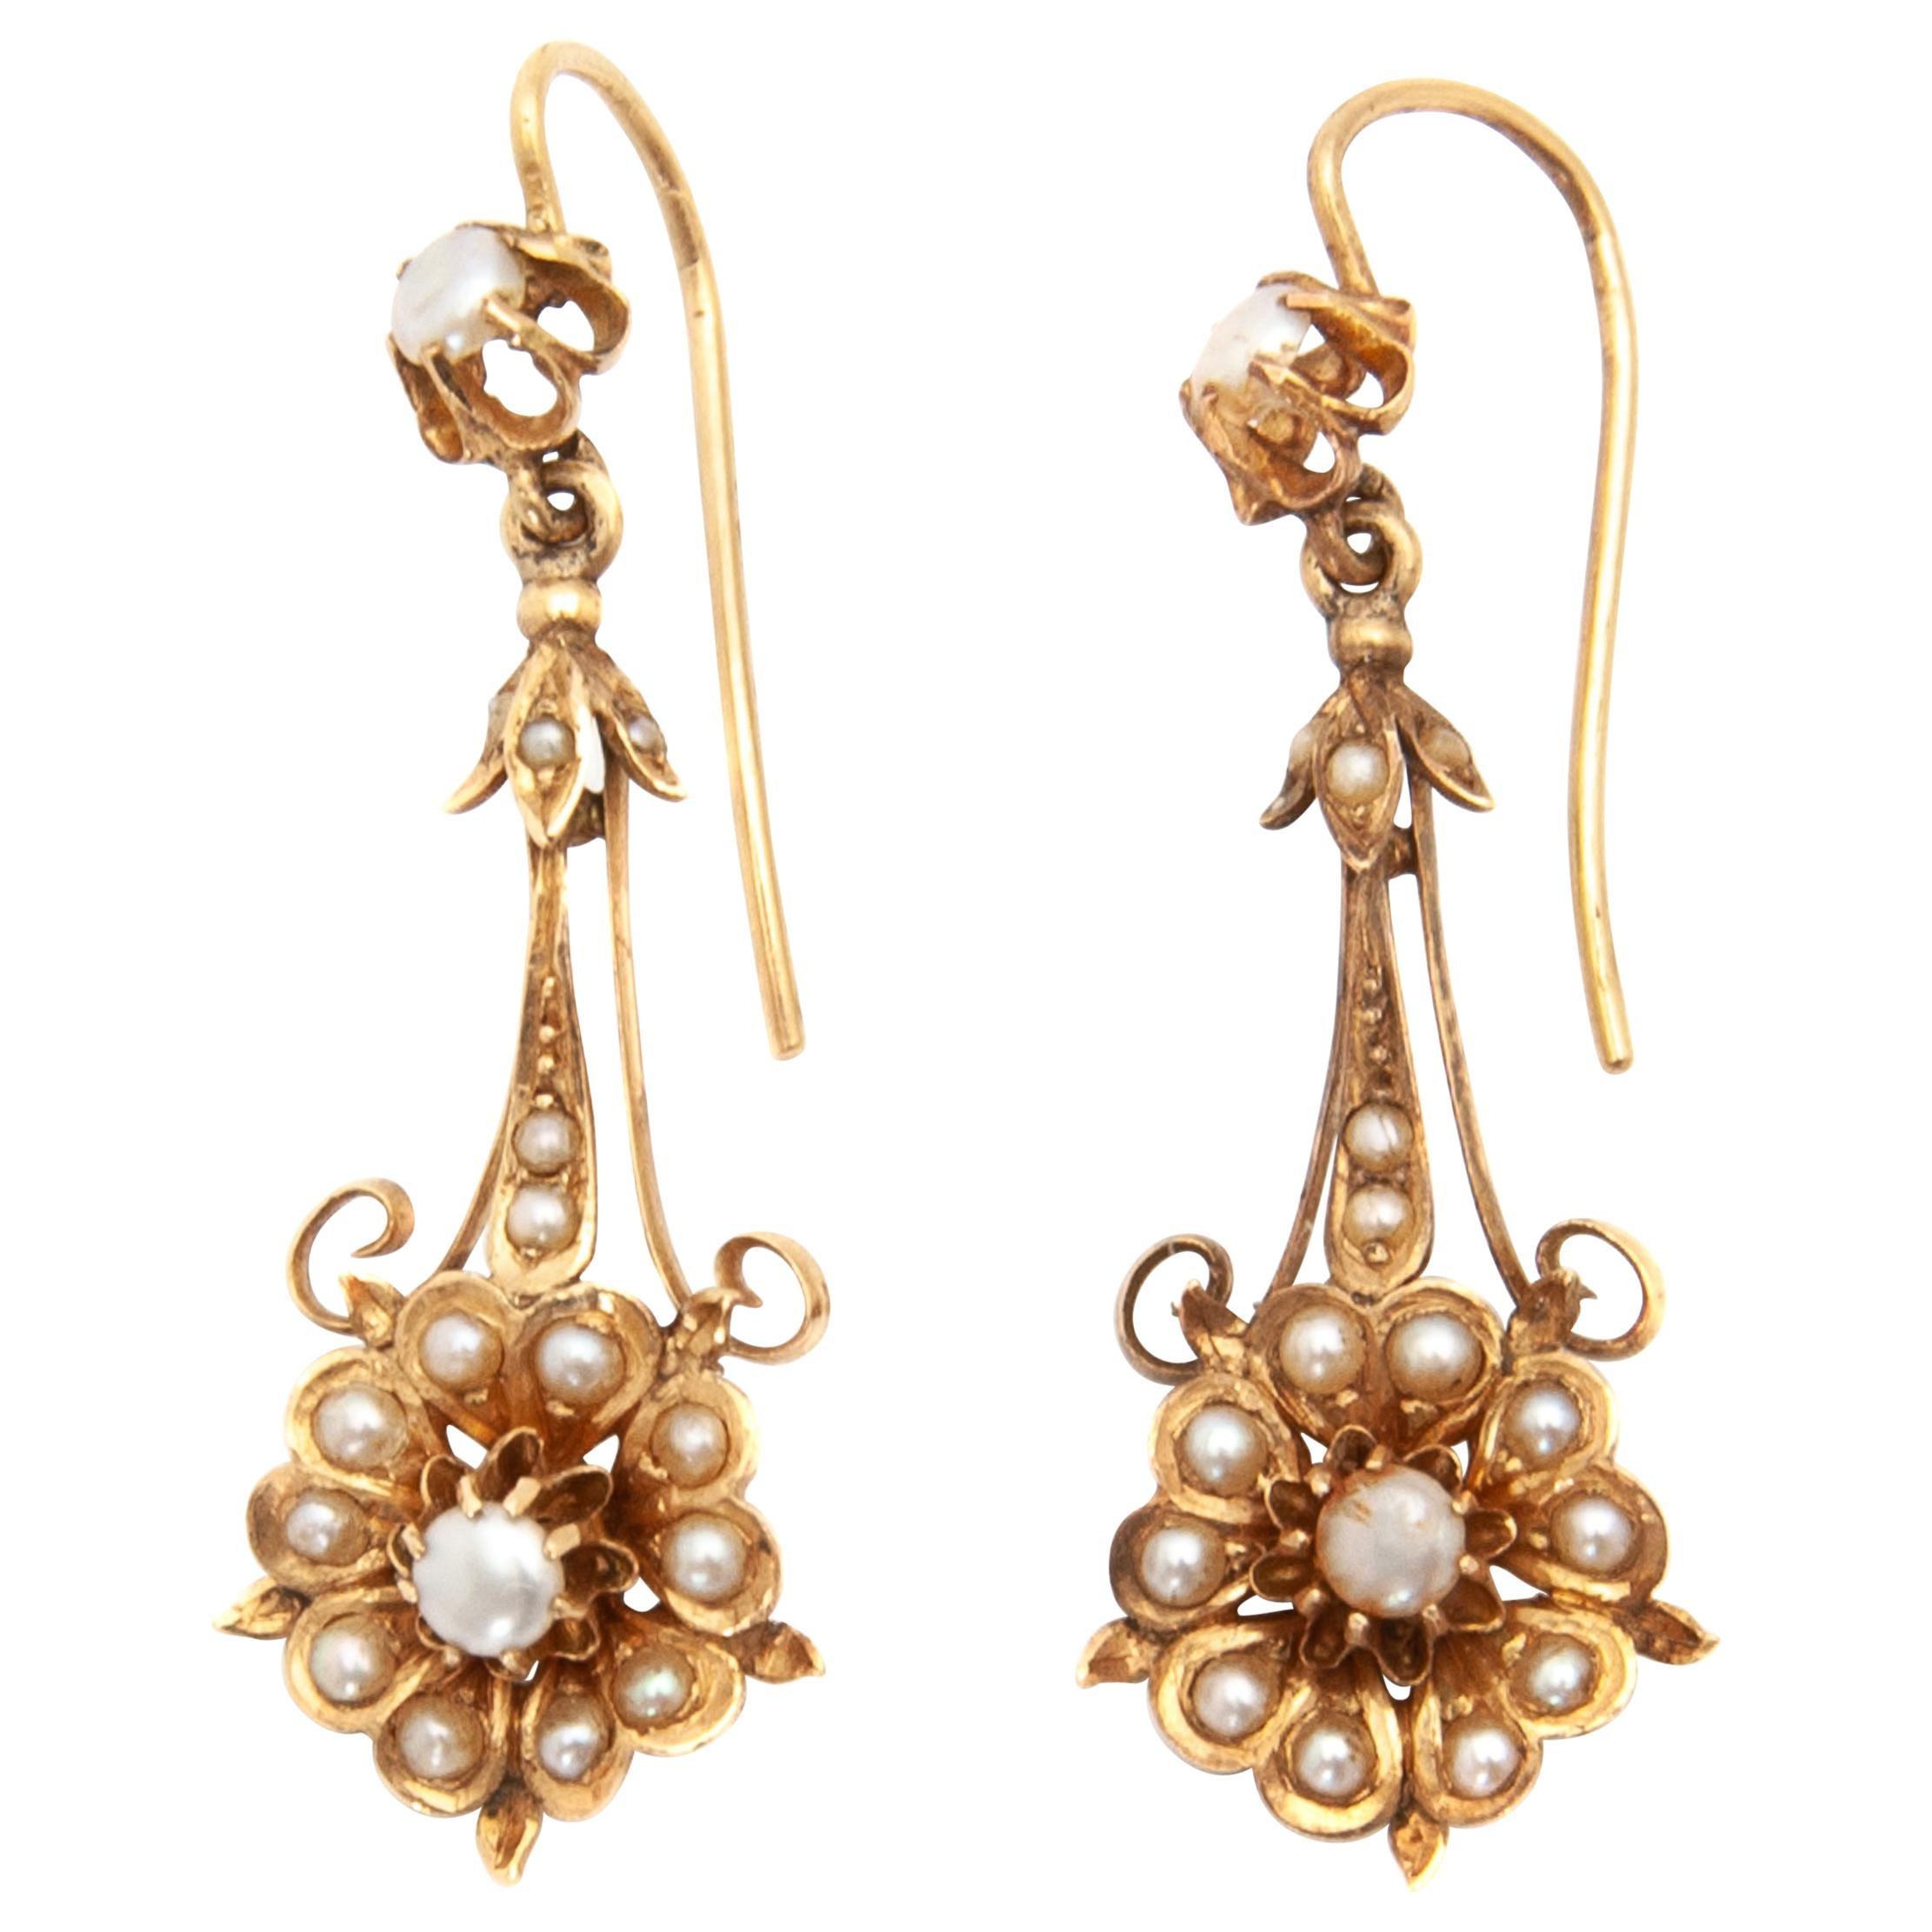 Victorian 14 Karat Yellow Gold Floral Pearl Earrings